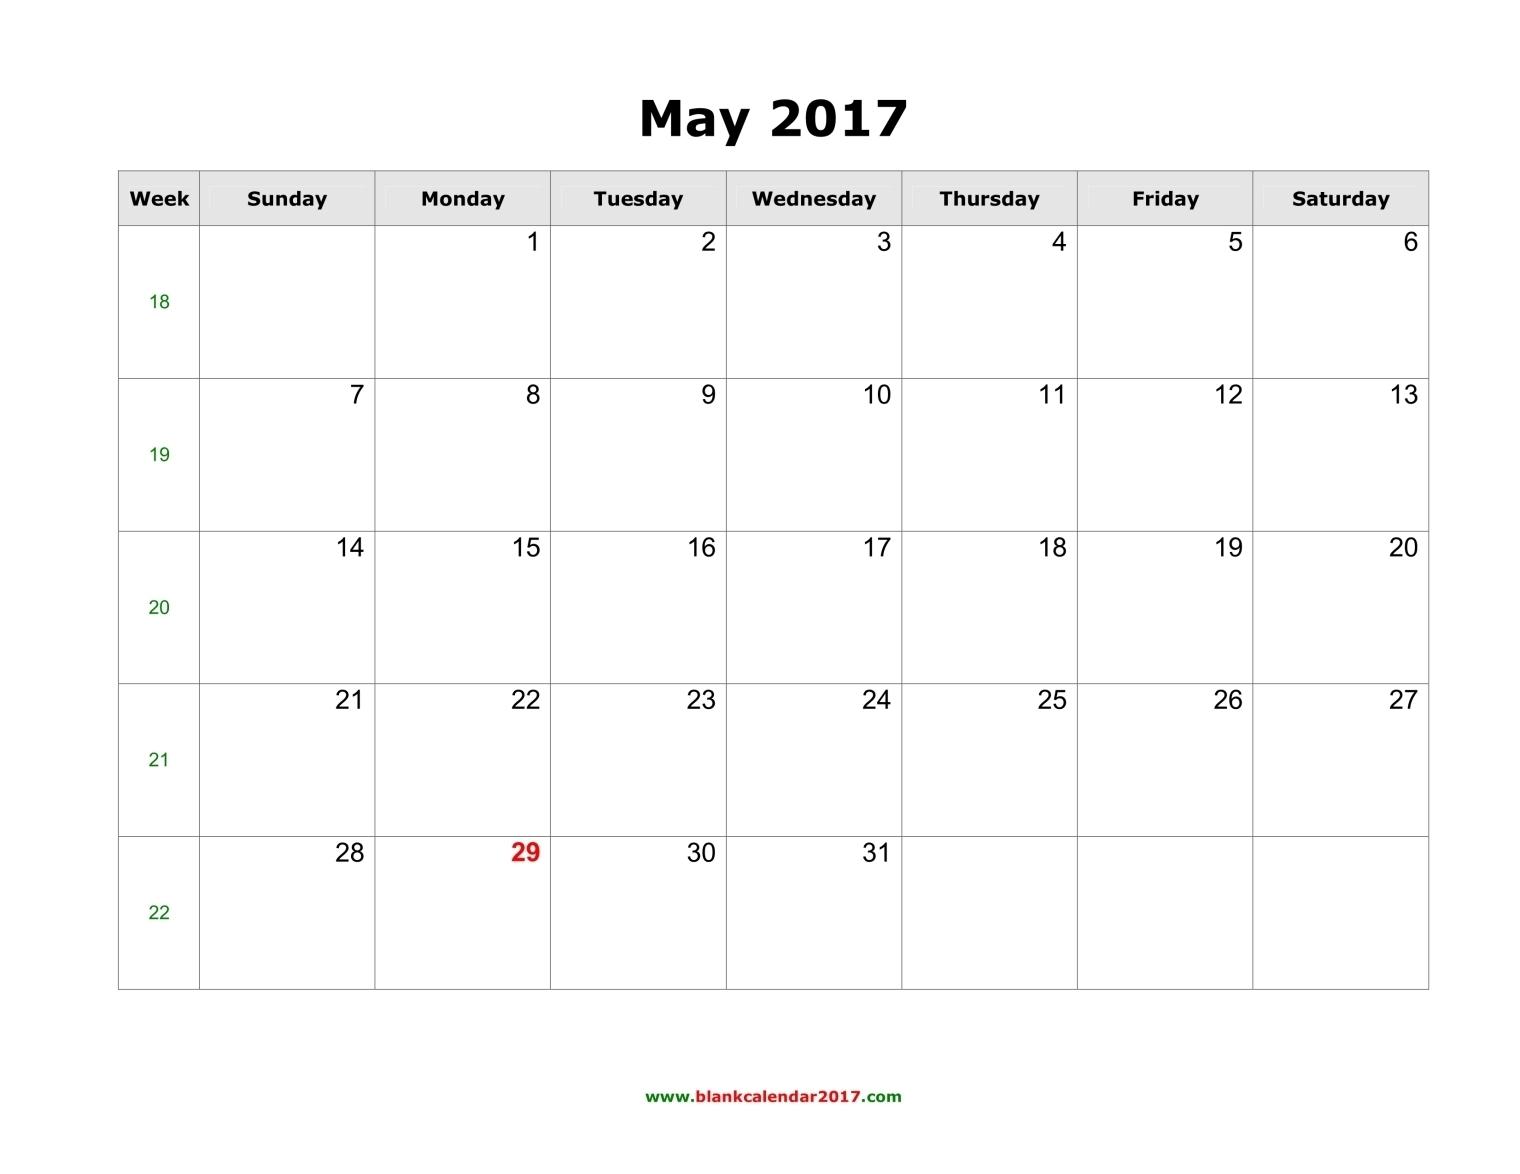 May 2017 Calendar Printable May 2017 Calendar Pinterest 2017  Xjb